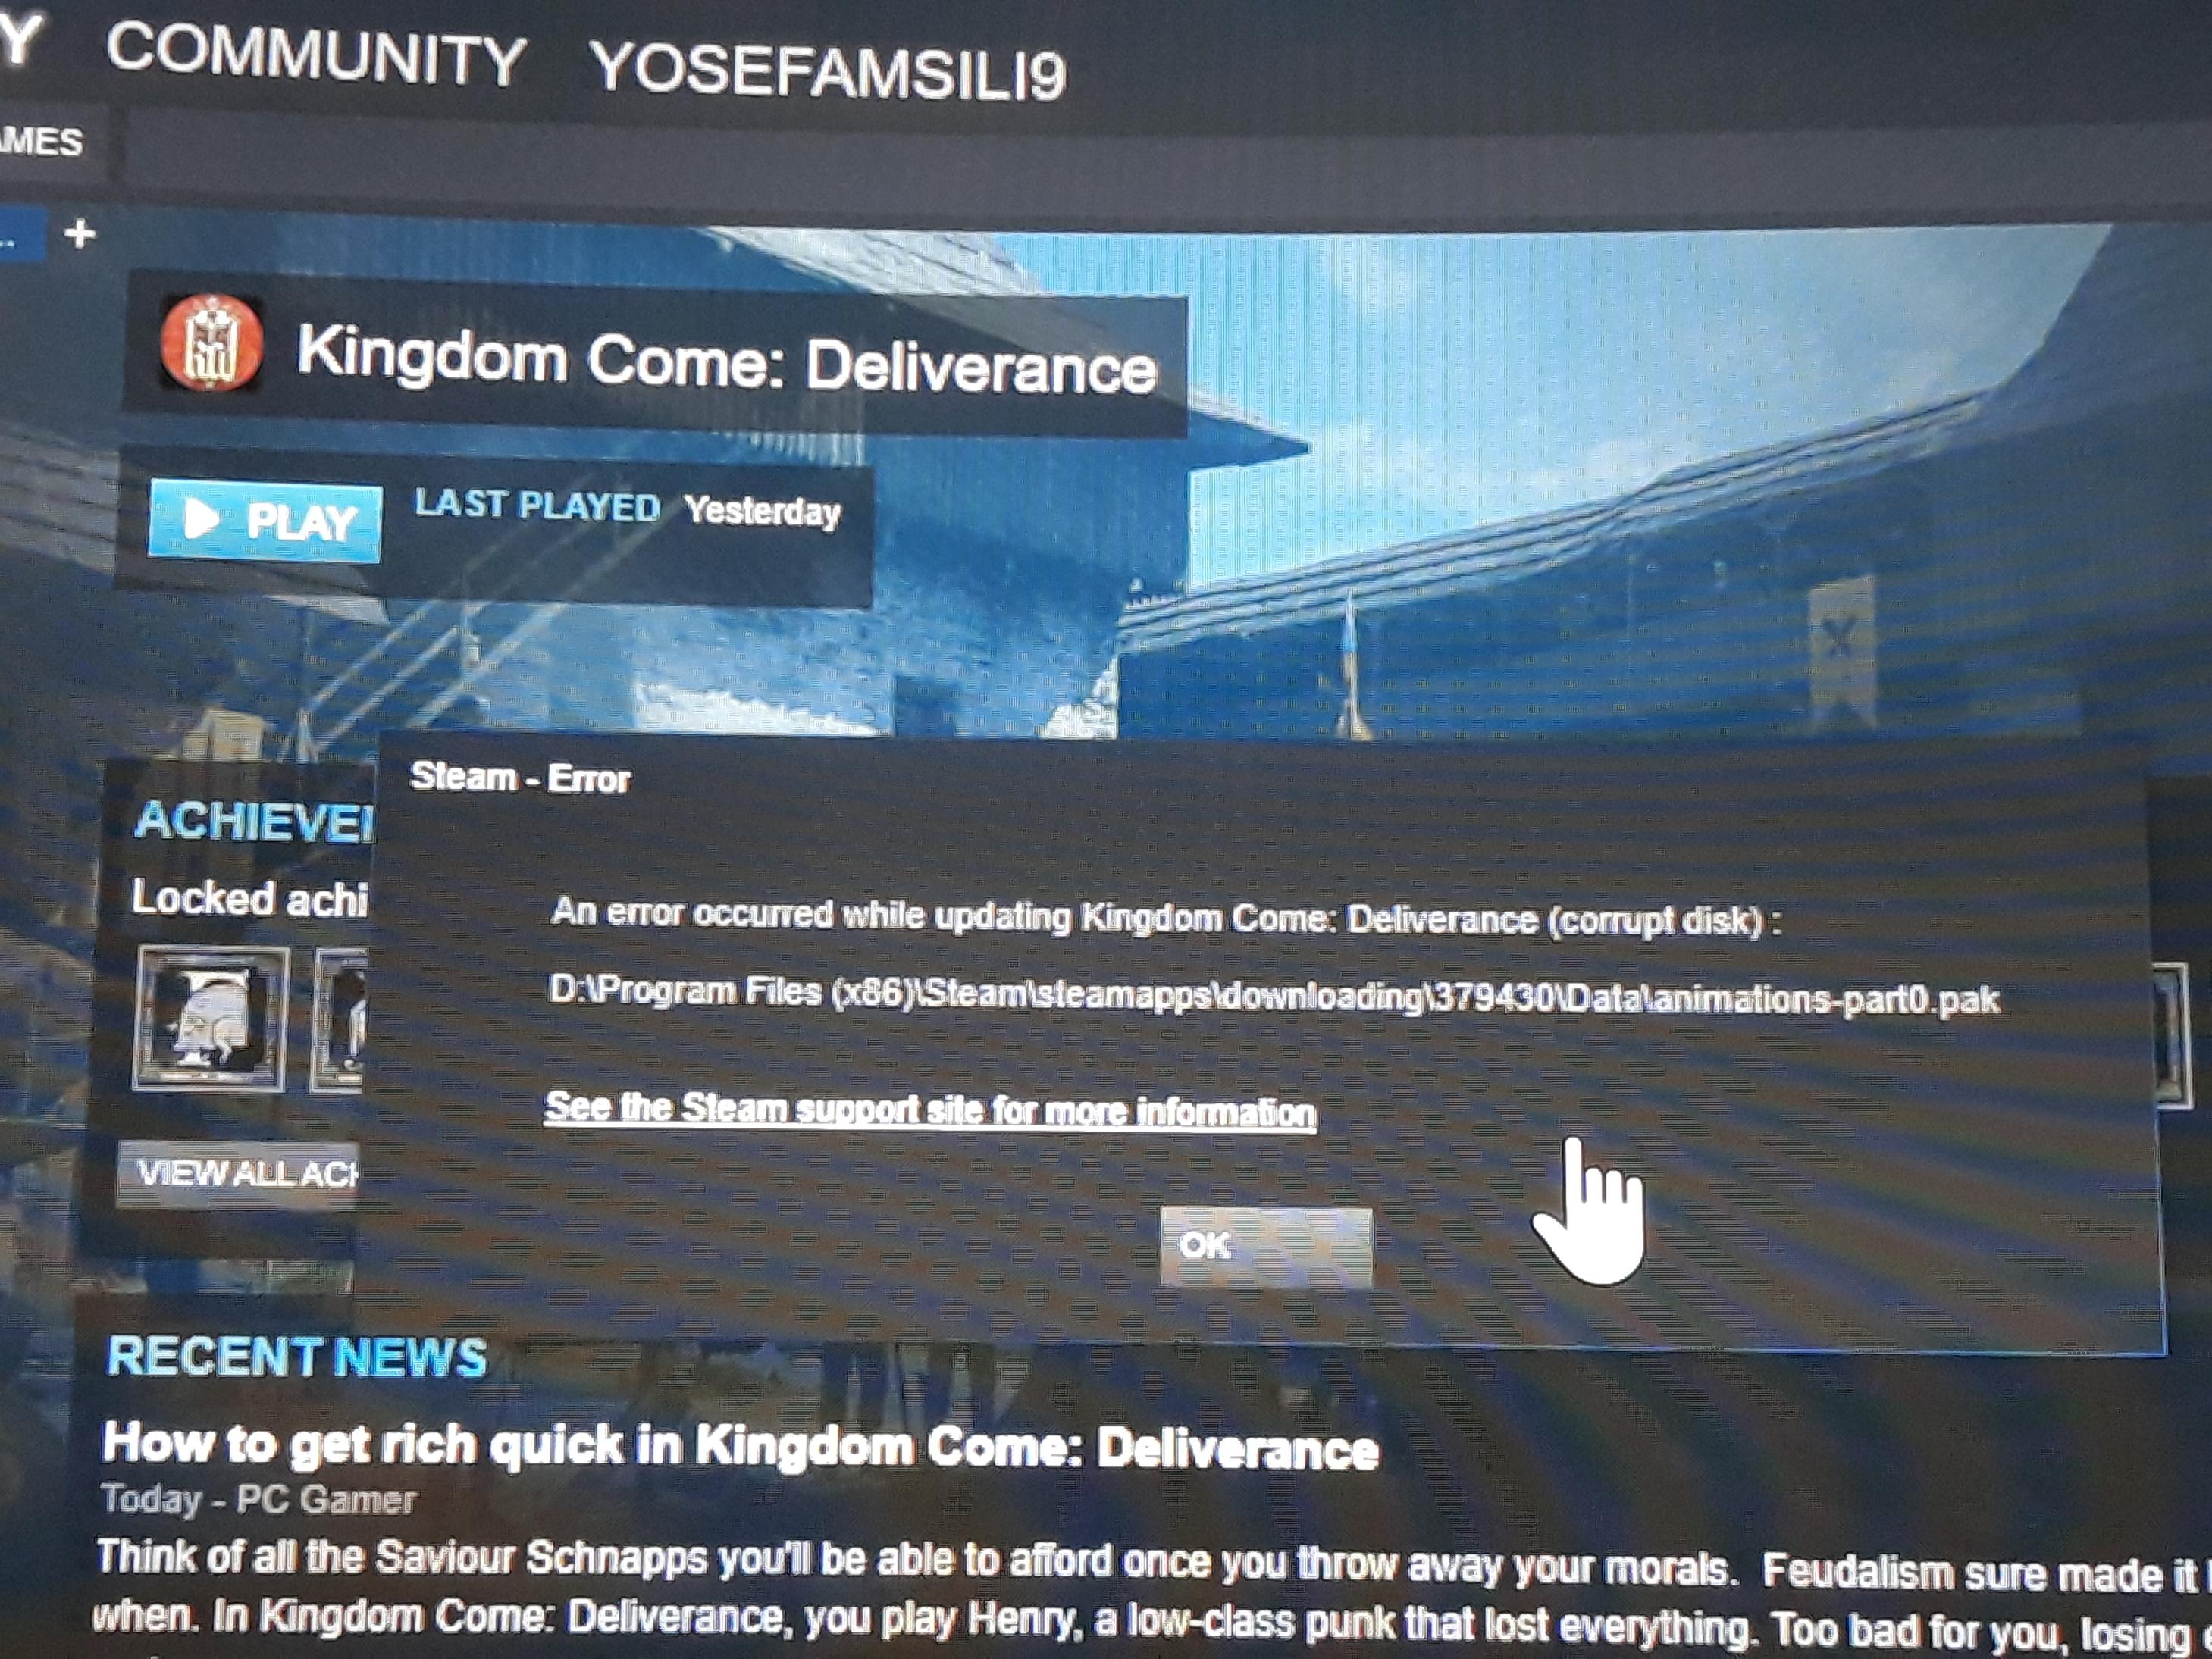 Not work (erorr) - Gameplay - Kingdom Come: Deliverance Forum